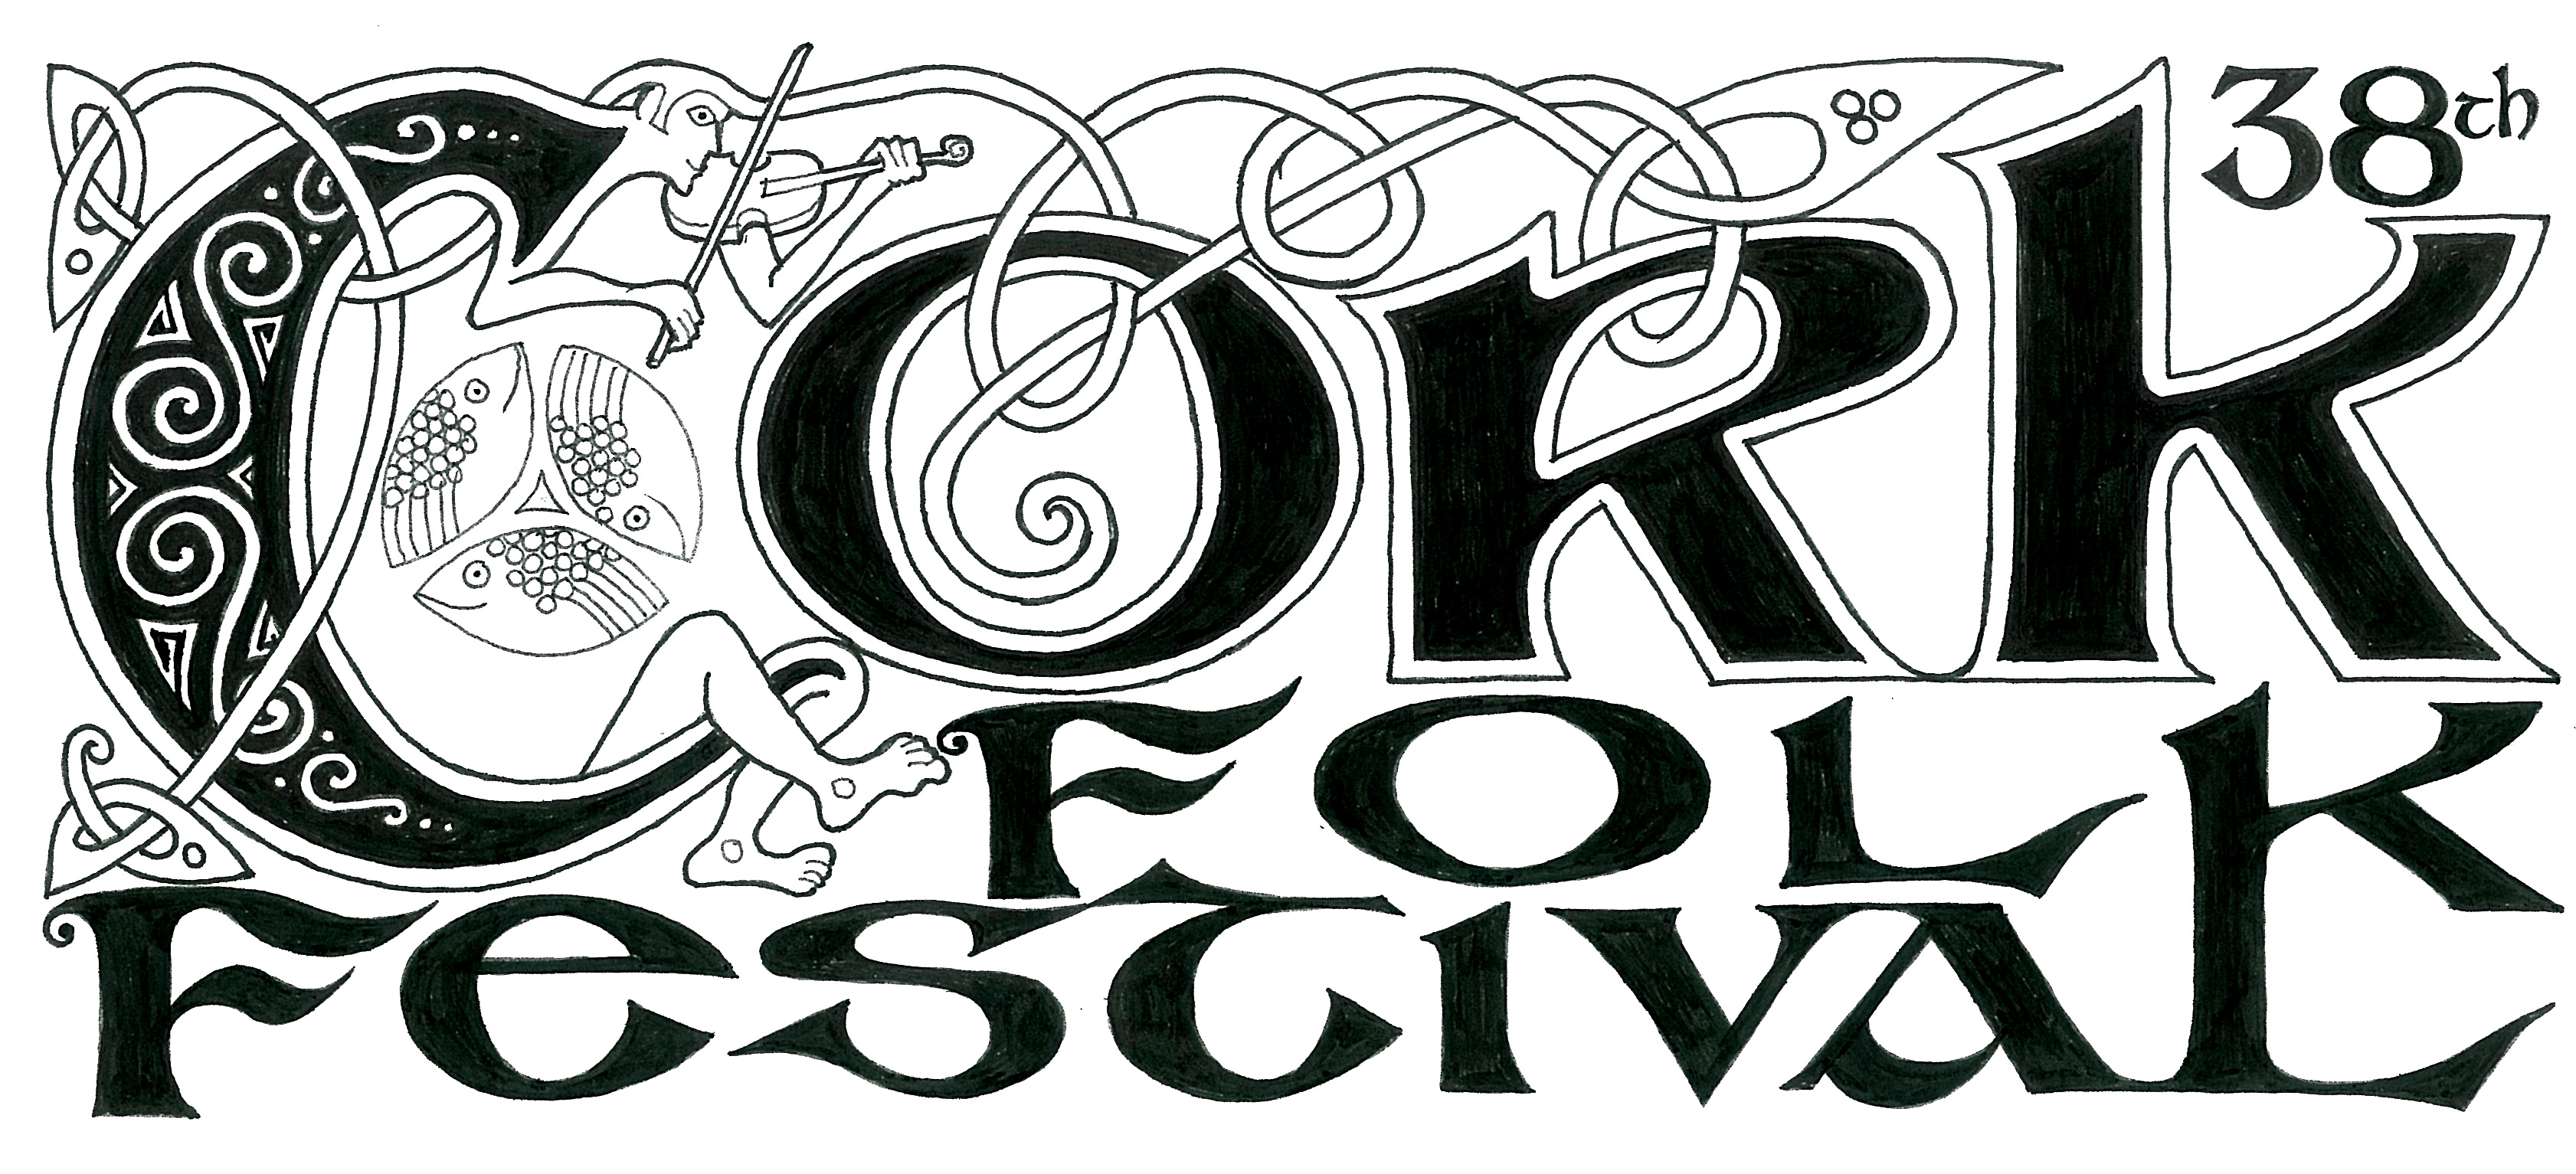 Cork Folk Festival - Cork, Ireland - 28th Sep - 1st October 2017